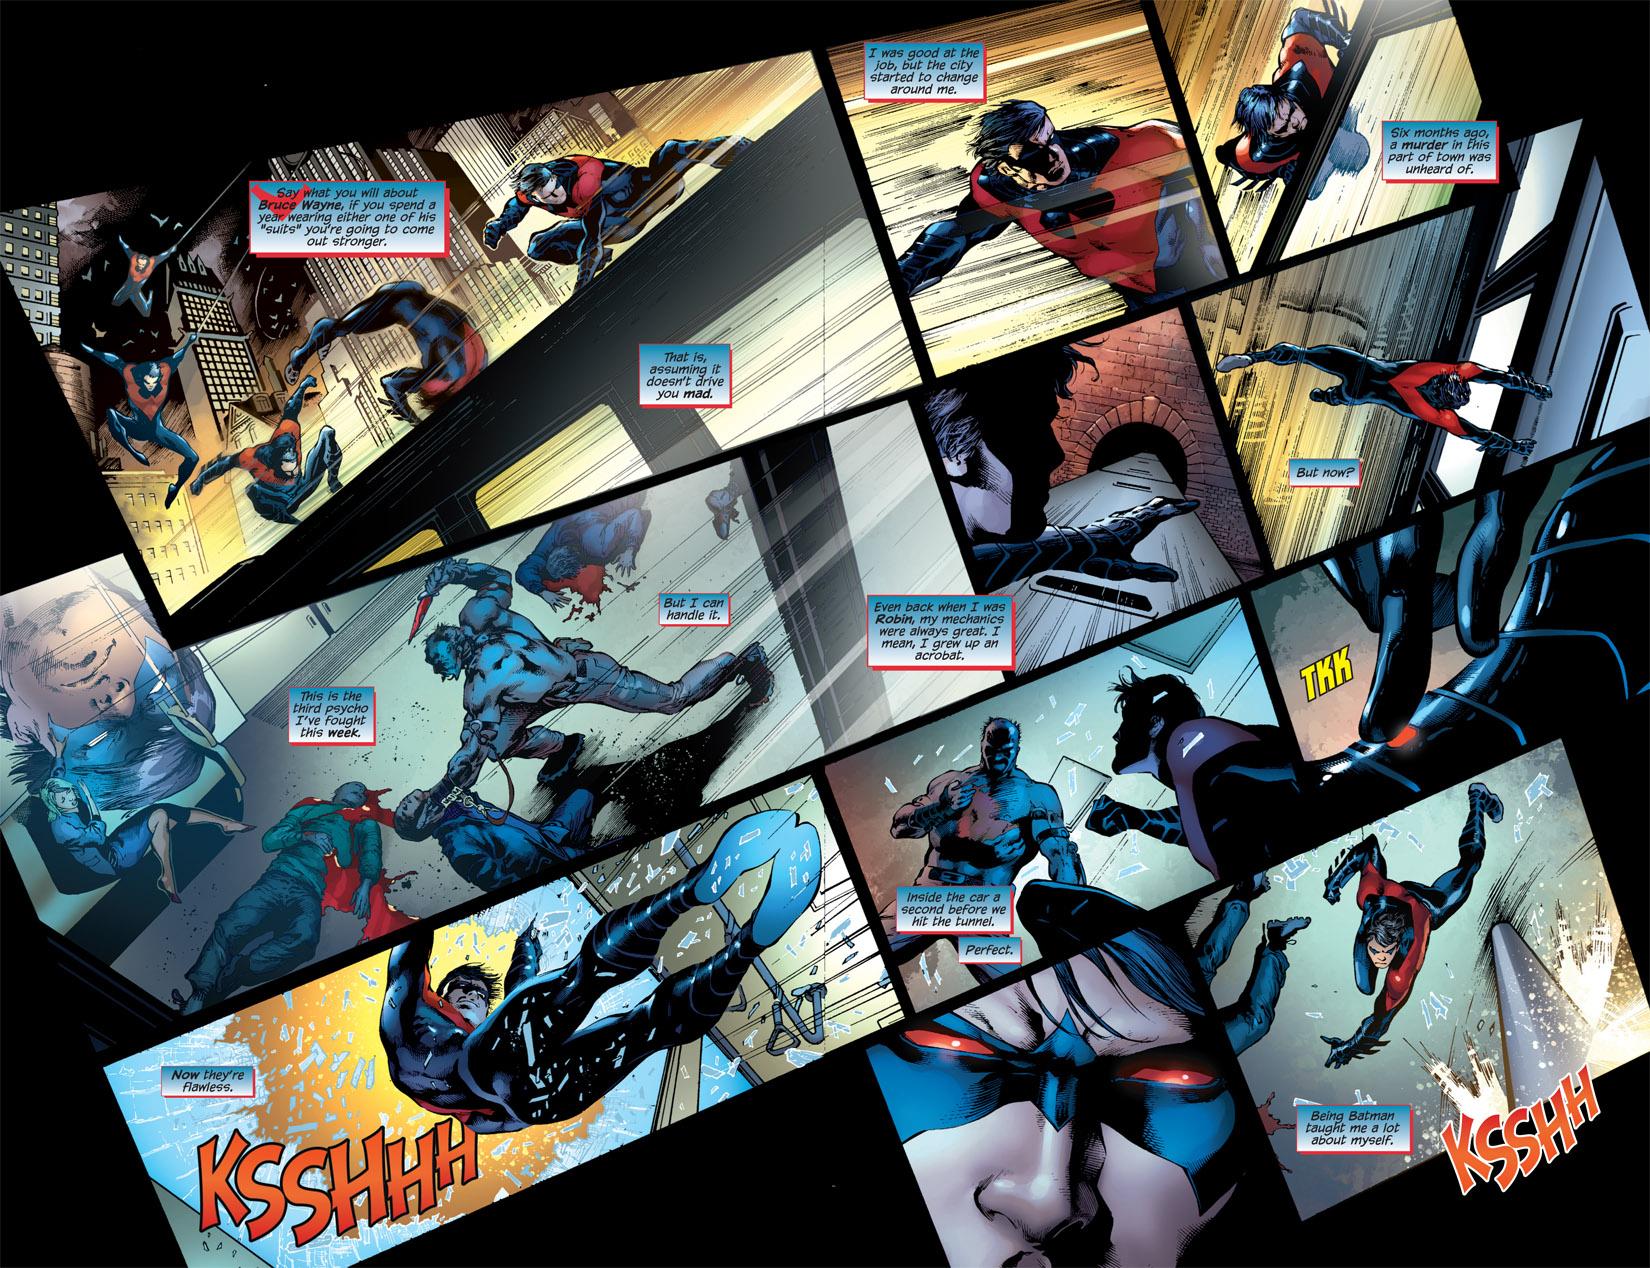 Nightwing 1 1